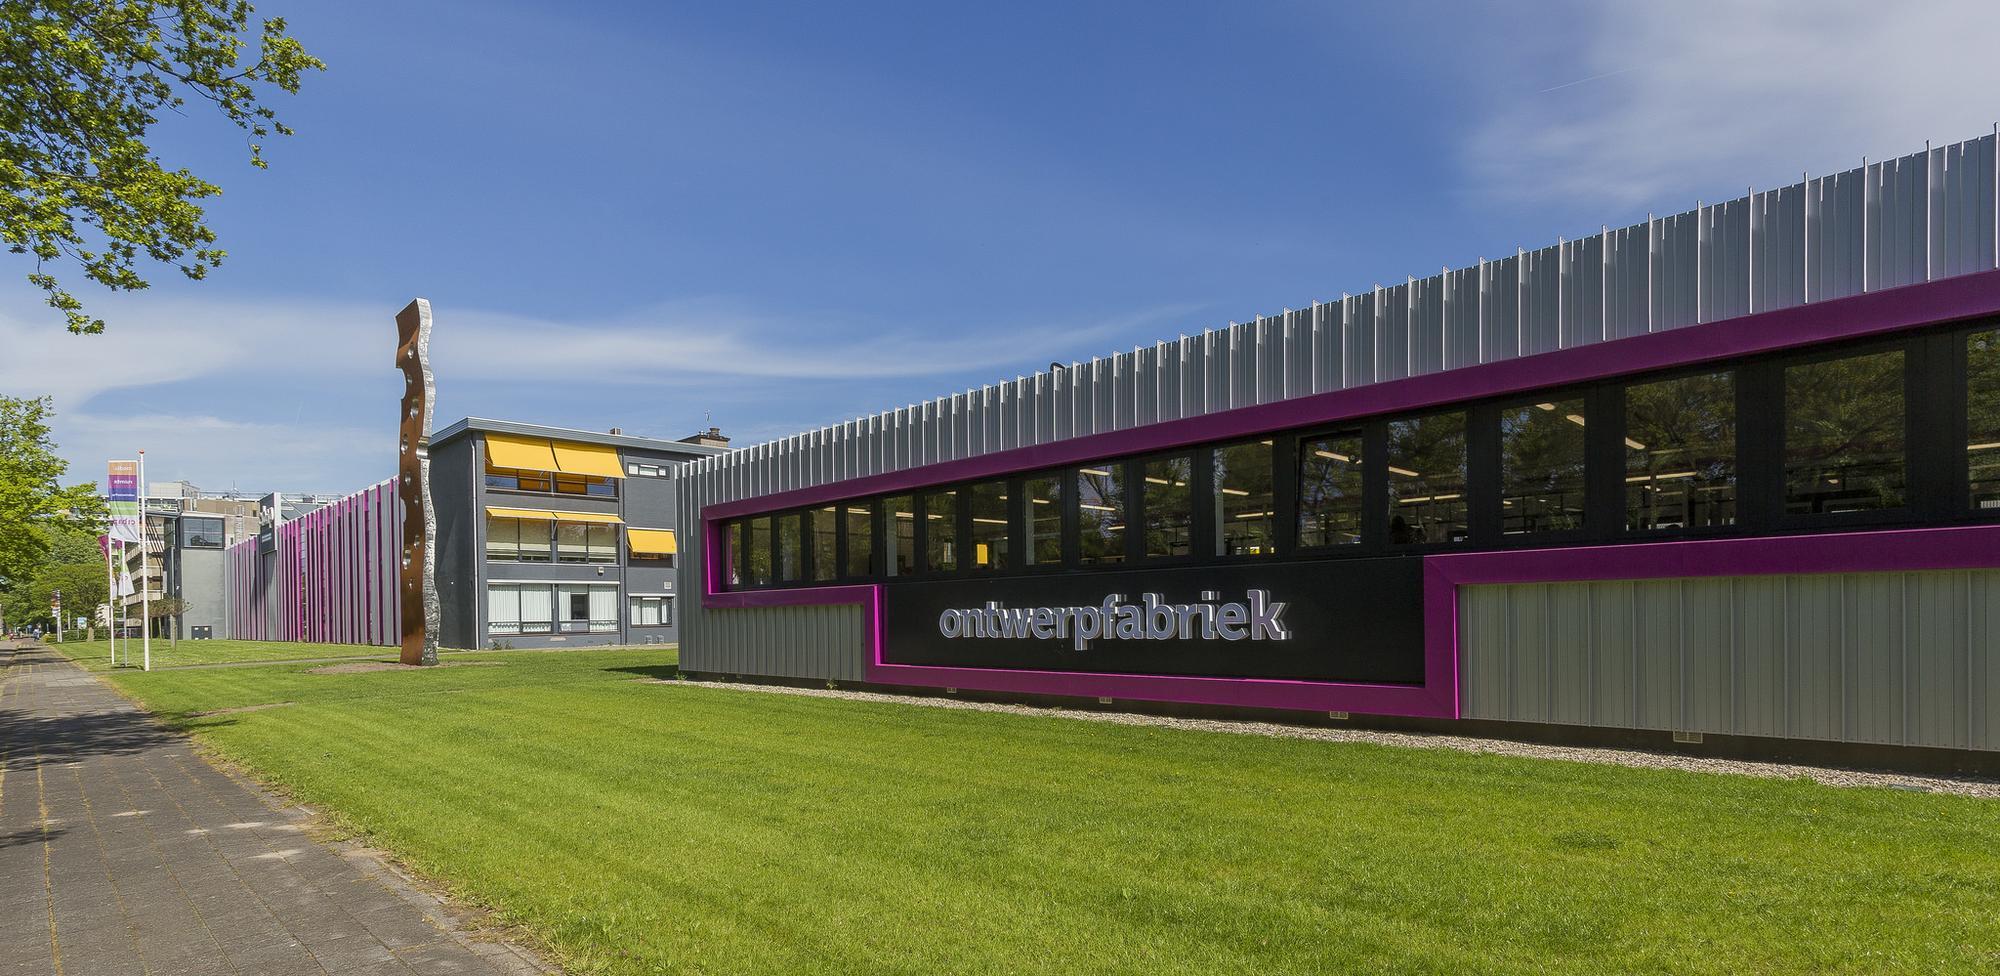 Cibap nieuwe partner Regio Zwolle IT Platform